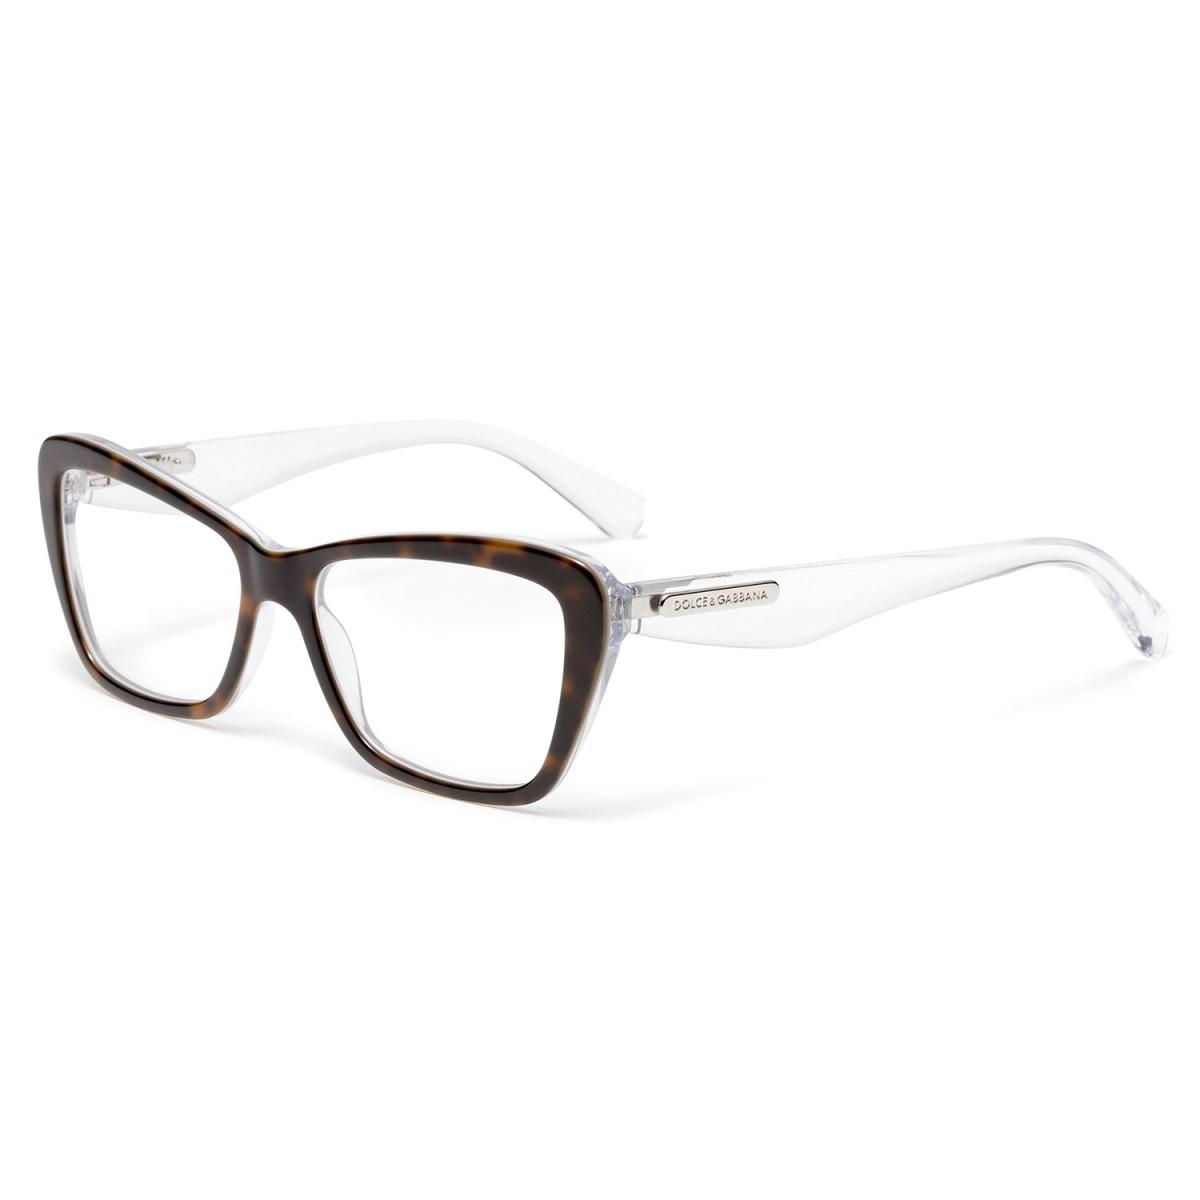 50b0504913f09 Óculos de Grau Dolce   Gabbana DG3194 2794